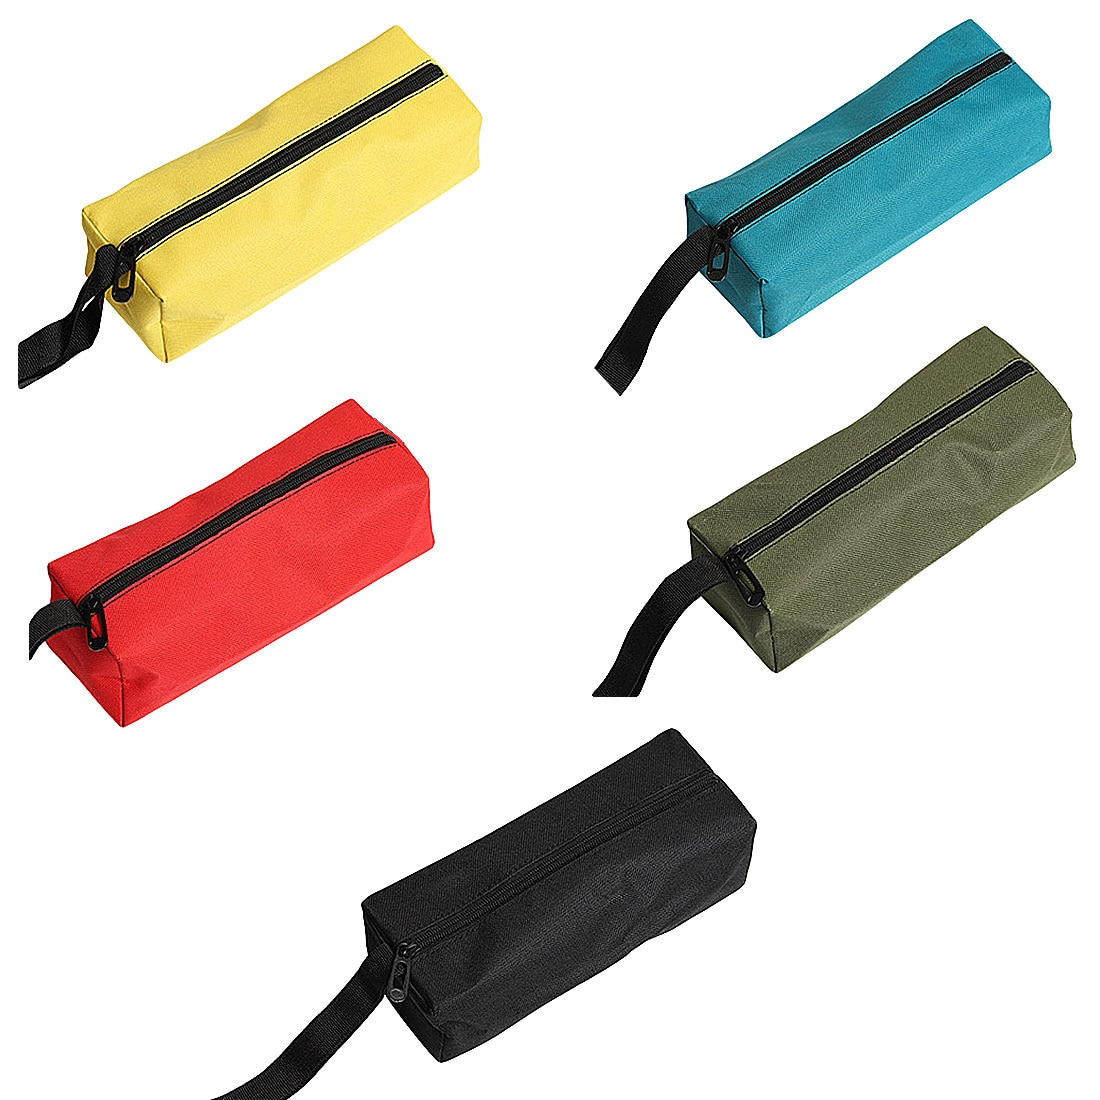 Tela oxford impermeable pesca viaje bolsa para herramientas de mano almacenamiento Metal tornillos taladro de uñas Bit bolsa organizadora maquillaje bolsa estuche